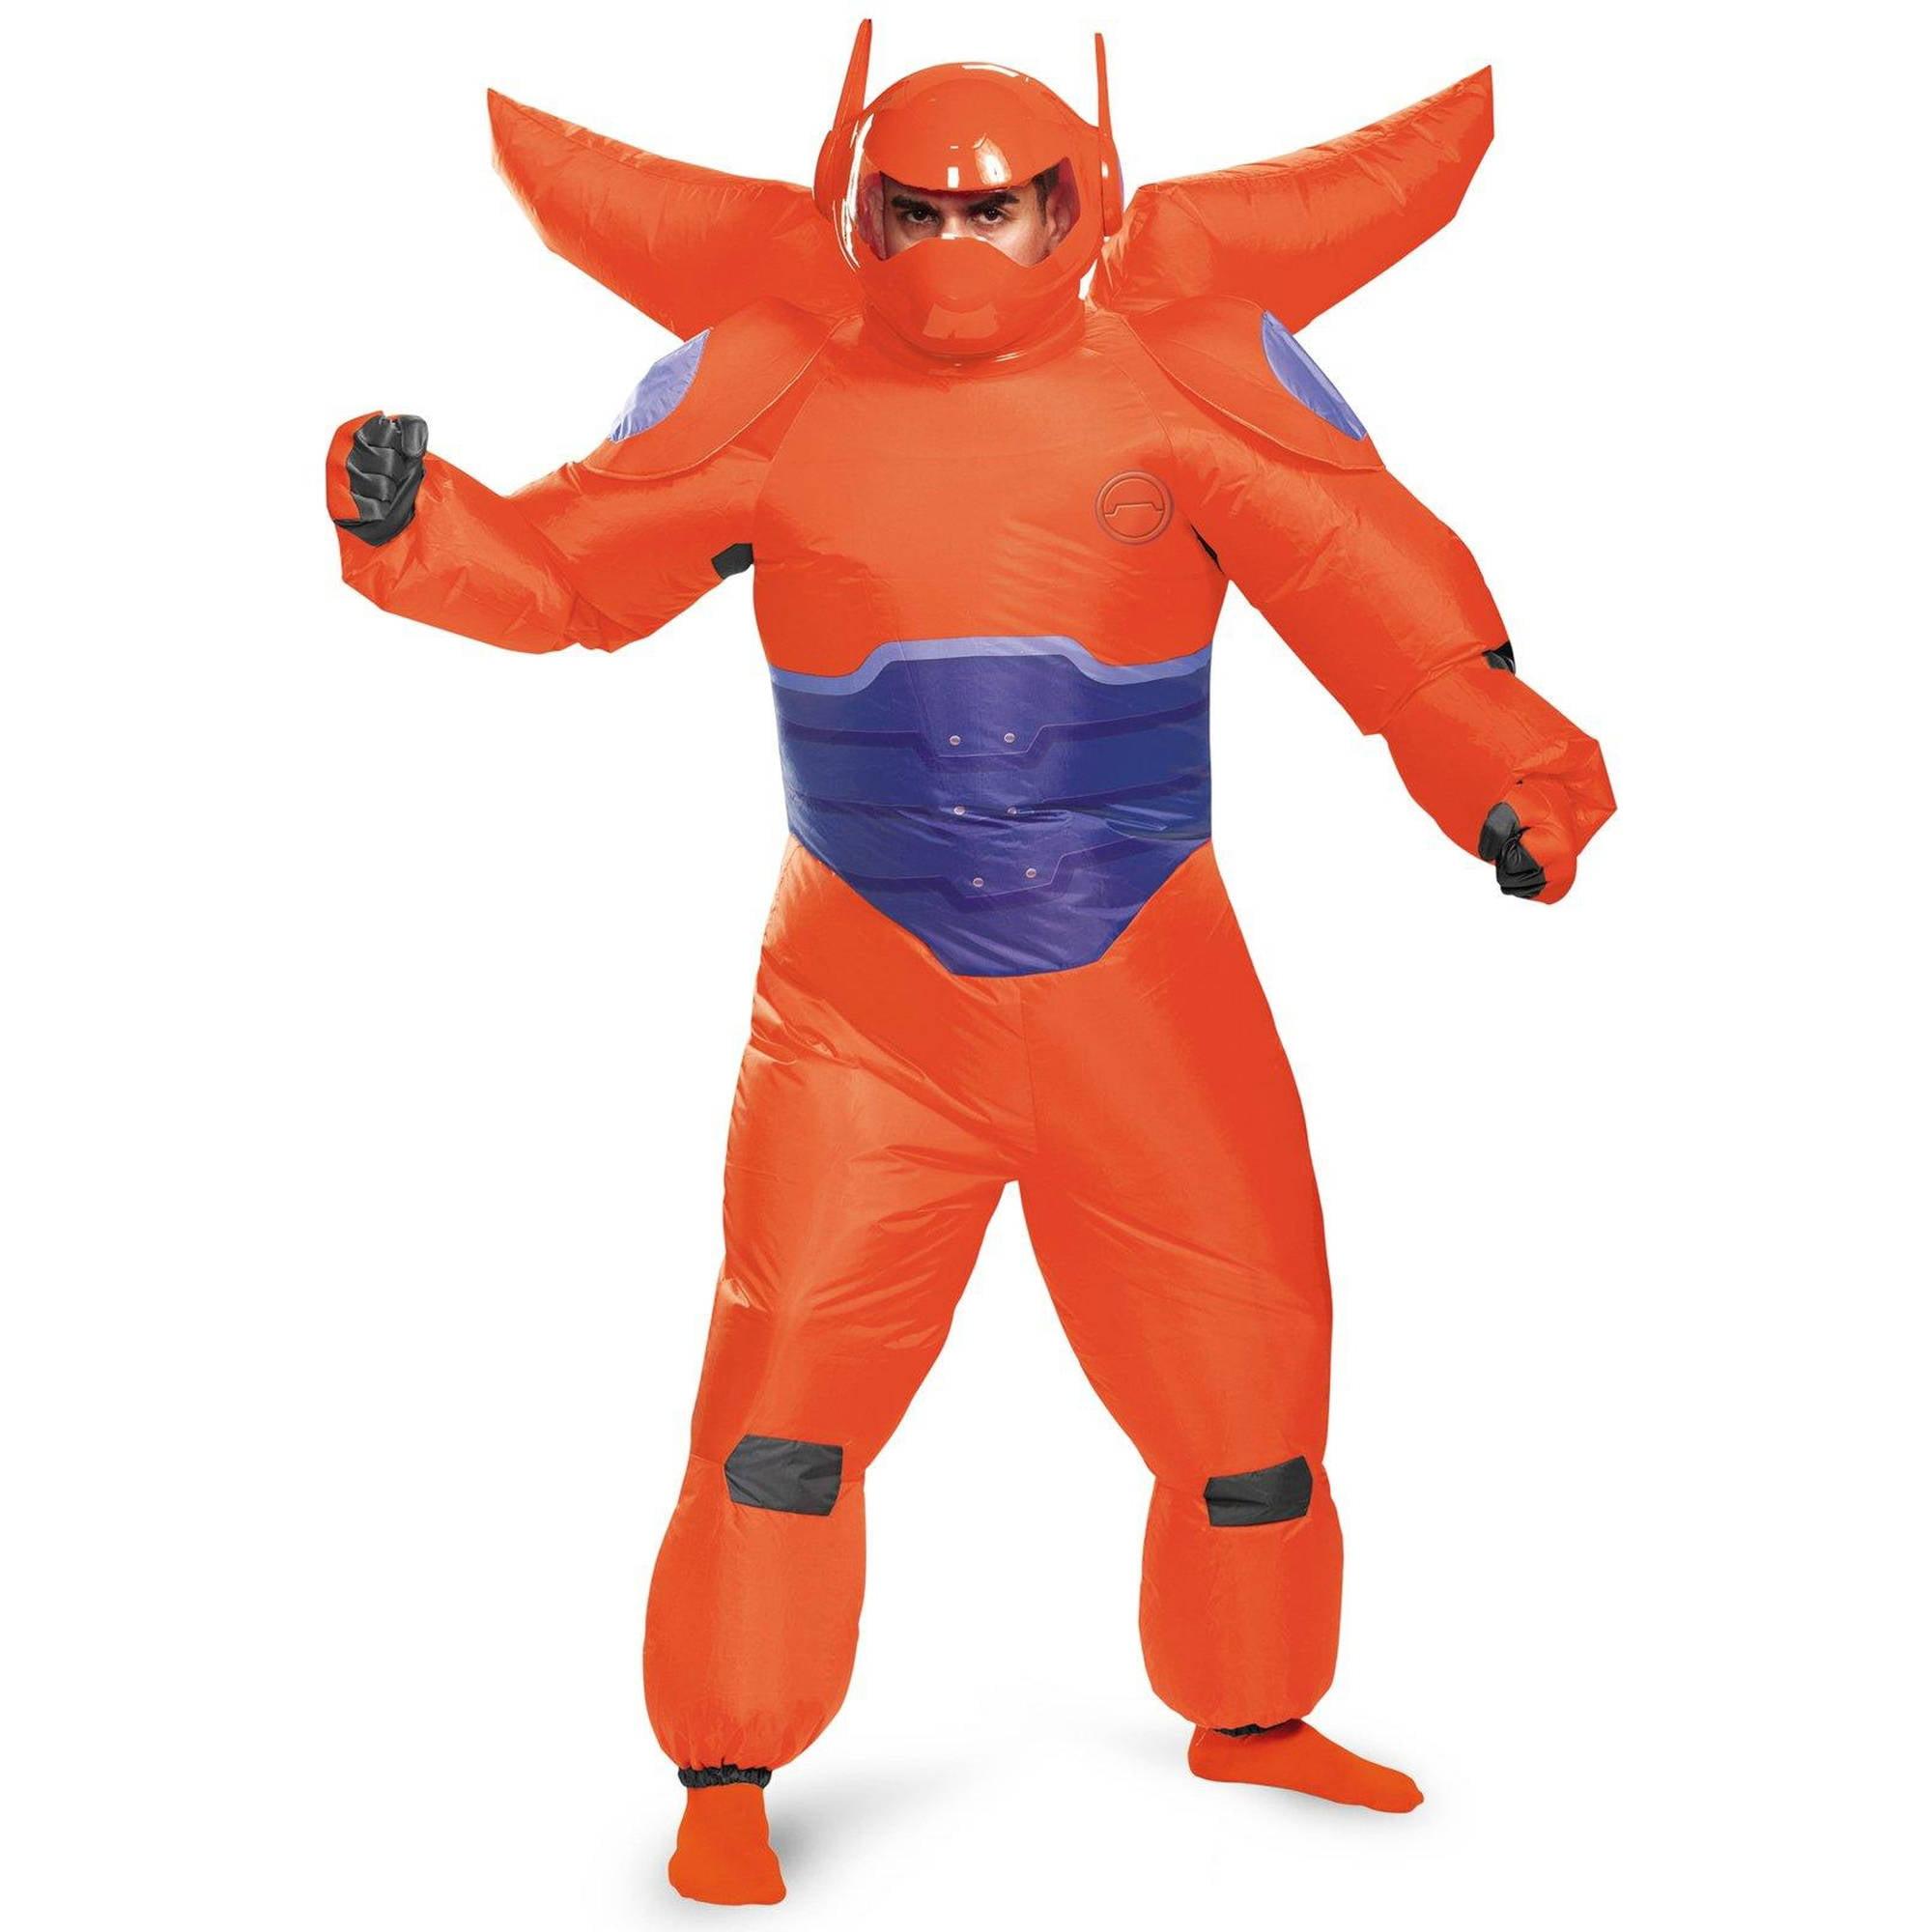 Big Hero 6 Red Baymax Inflatable Adult Halloween Costume, 1 Size